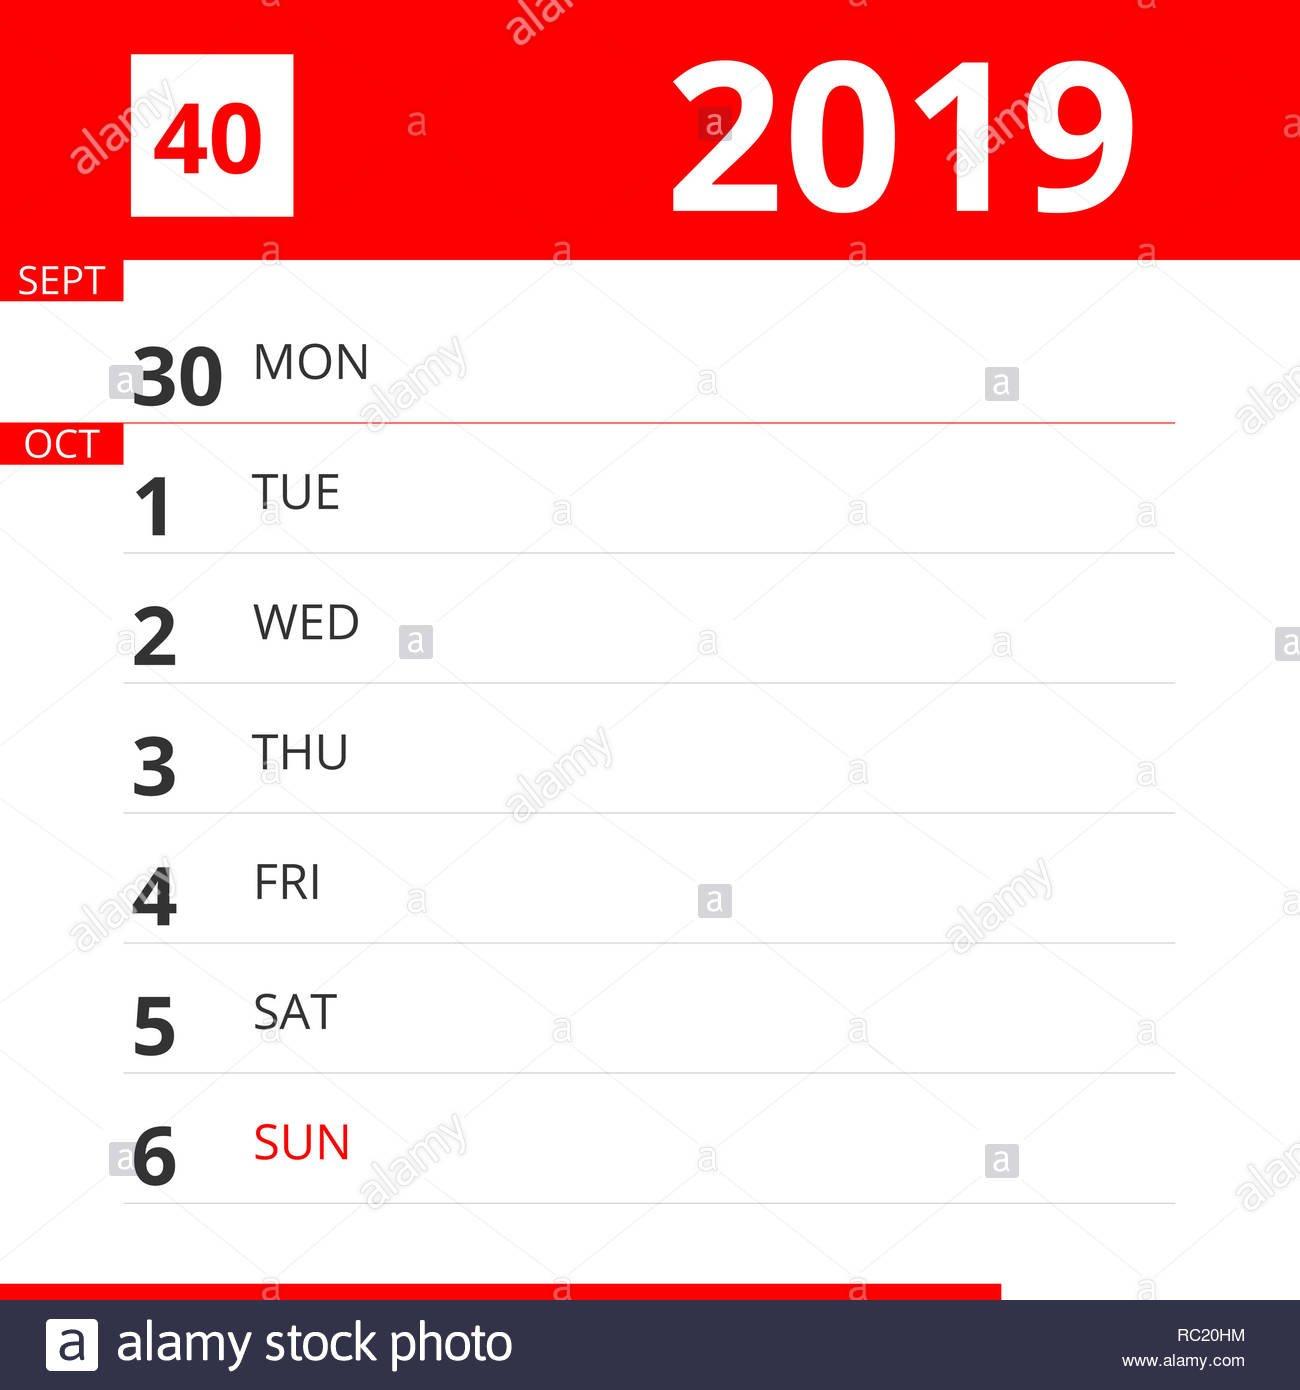 Calendar Planner For Week 40 In 2019, Ends October 6, 2019 Stock Calendar Week 40 2019